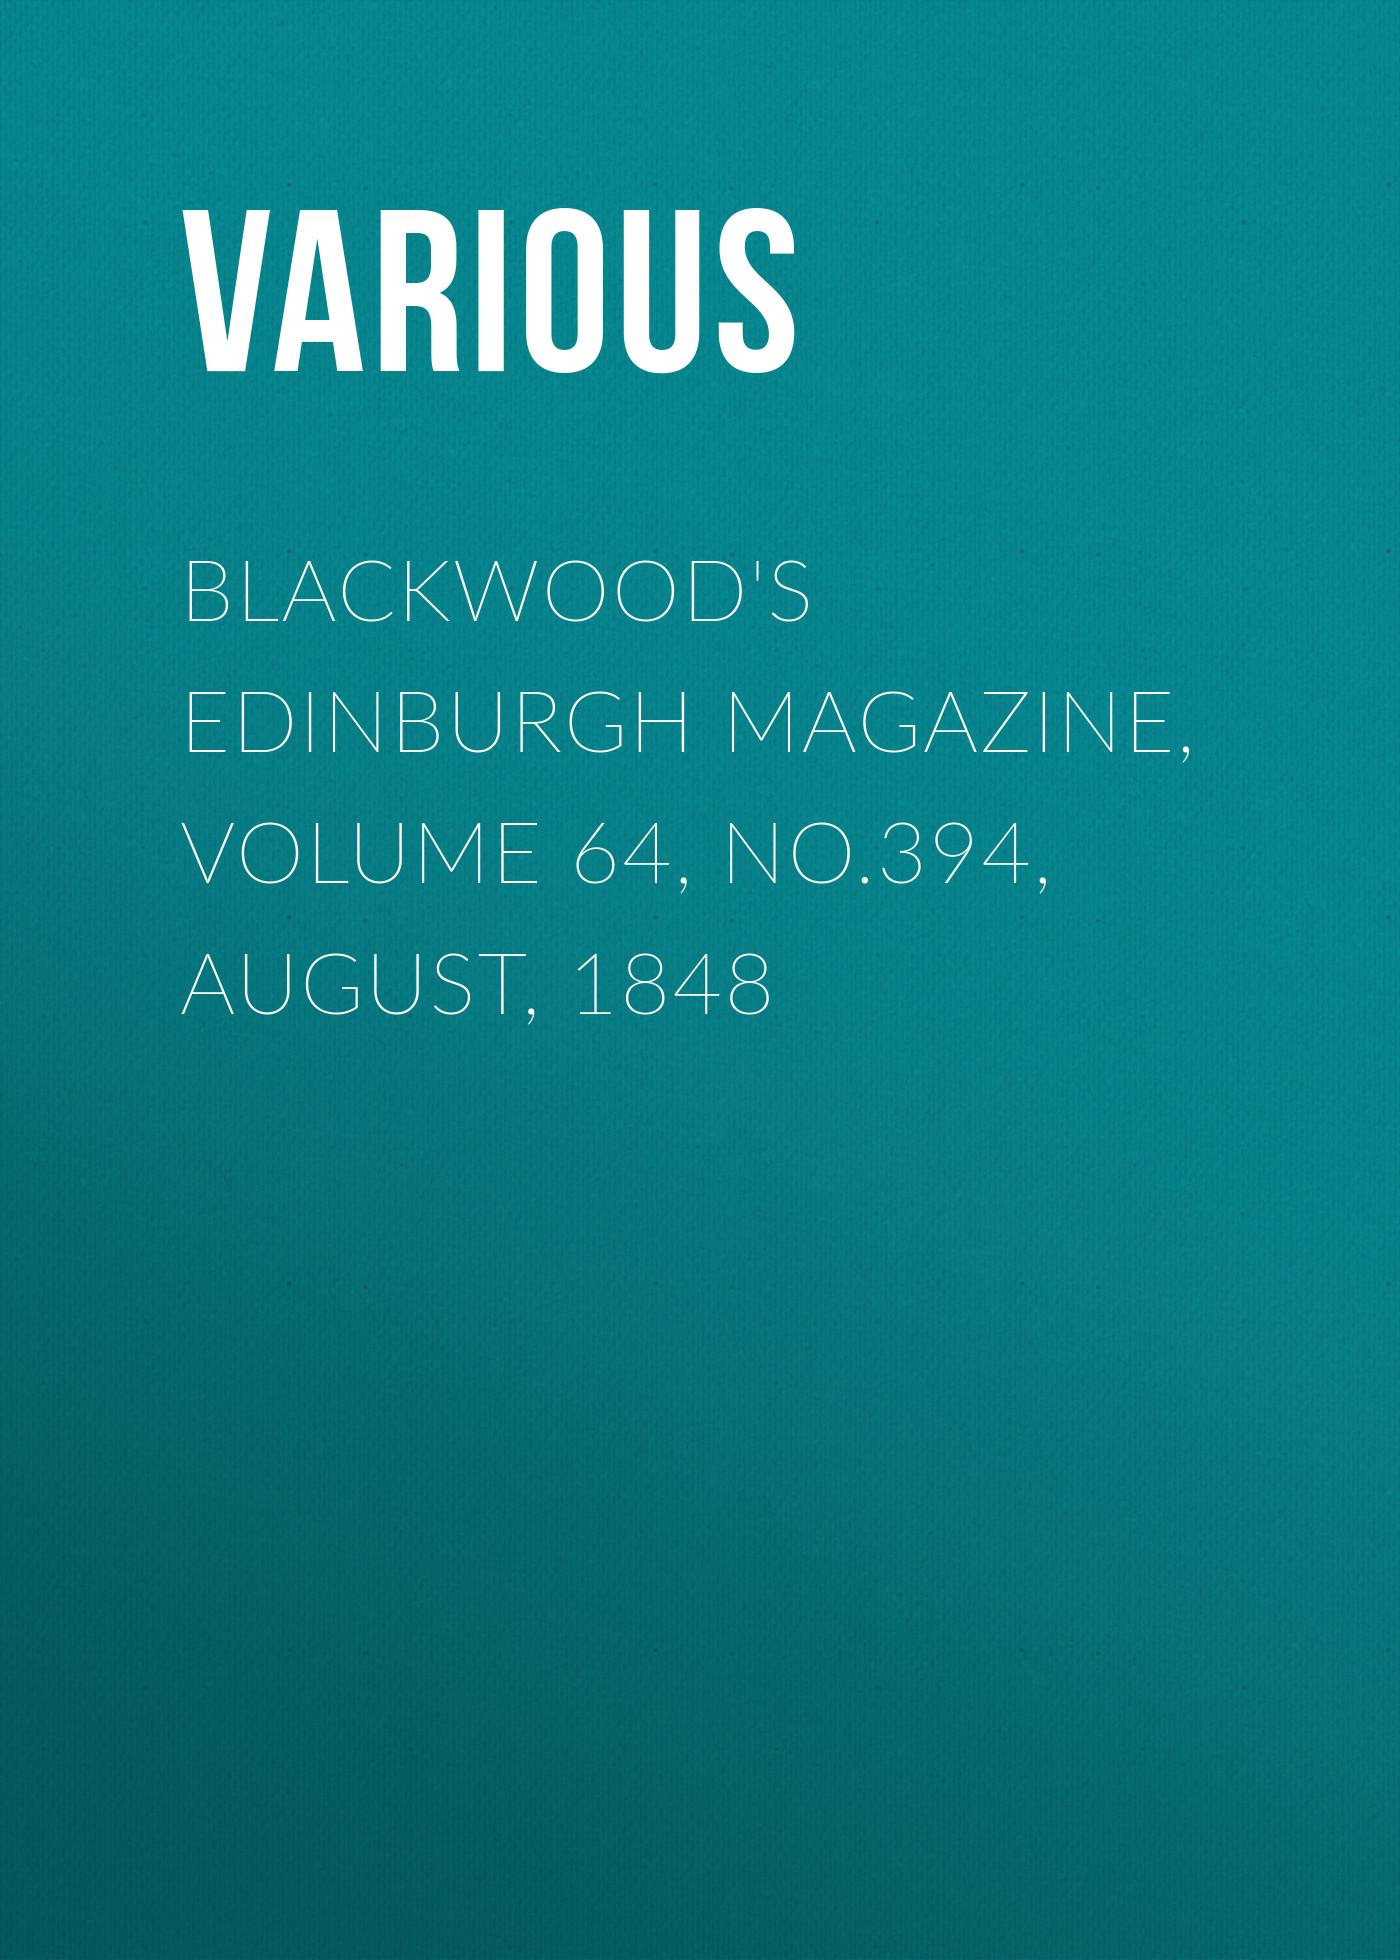 Various Blackwood's Edinburgh Magazine, Volume 64, No.394, August, 1848 henry woodward geological magazine volume 22